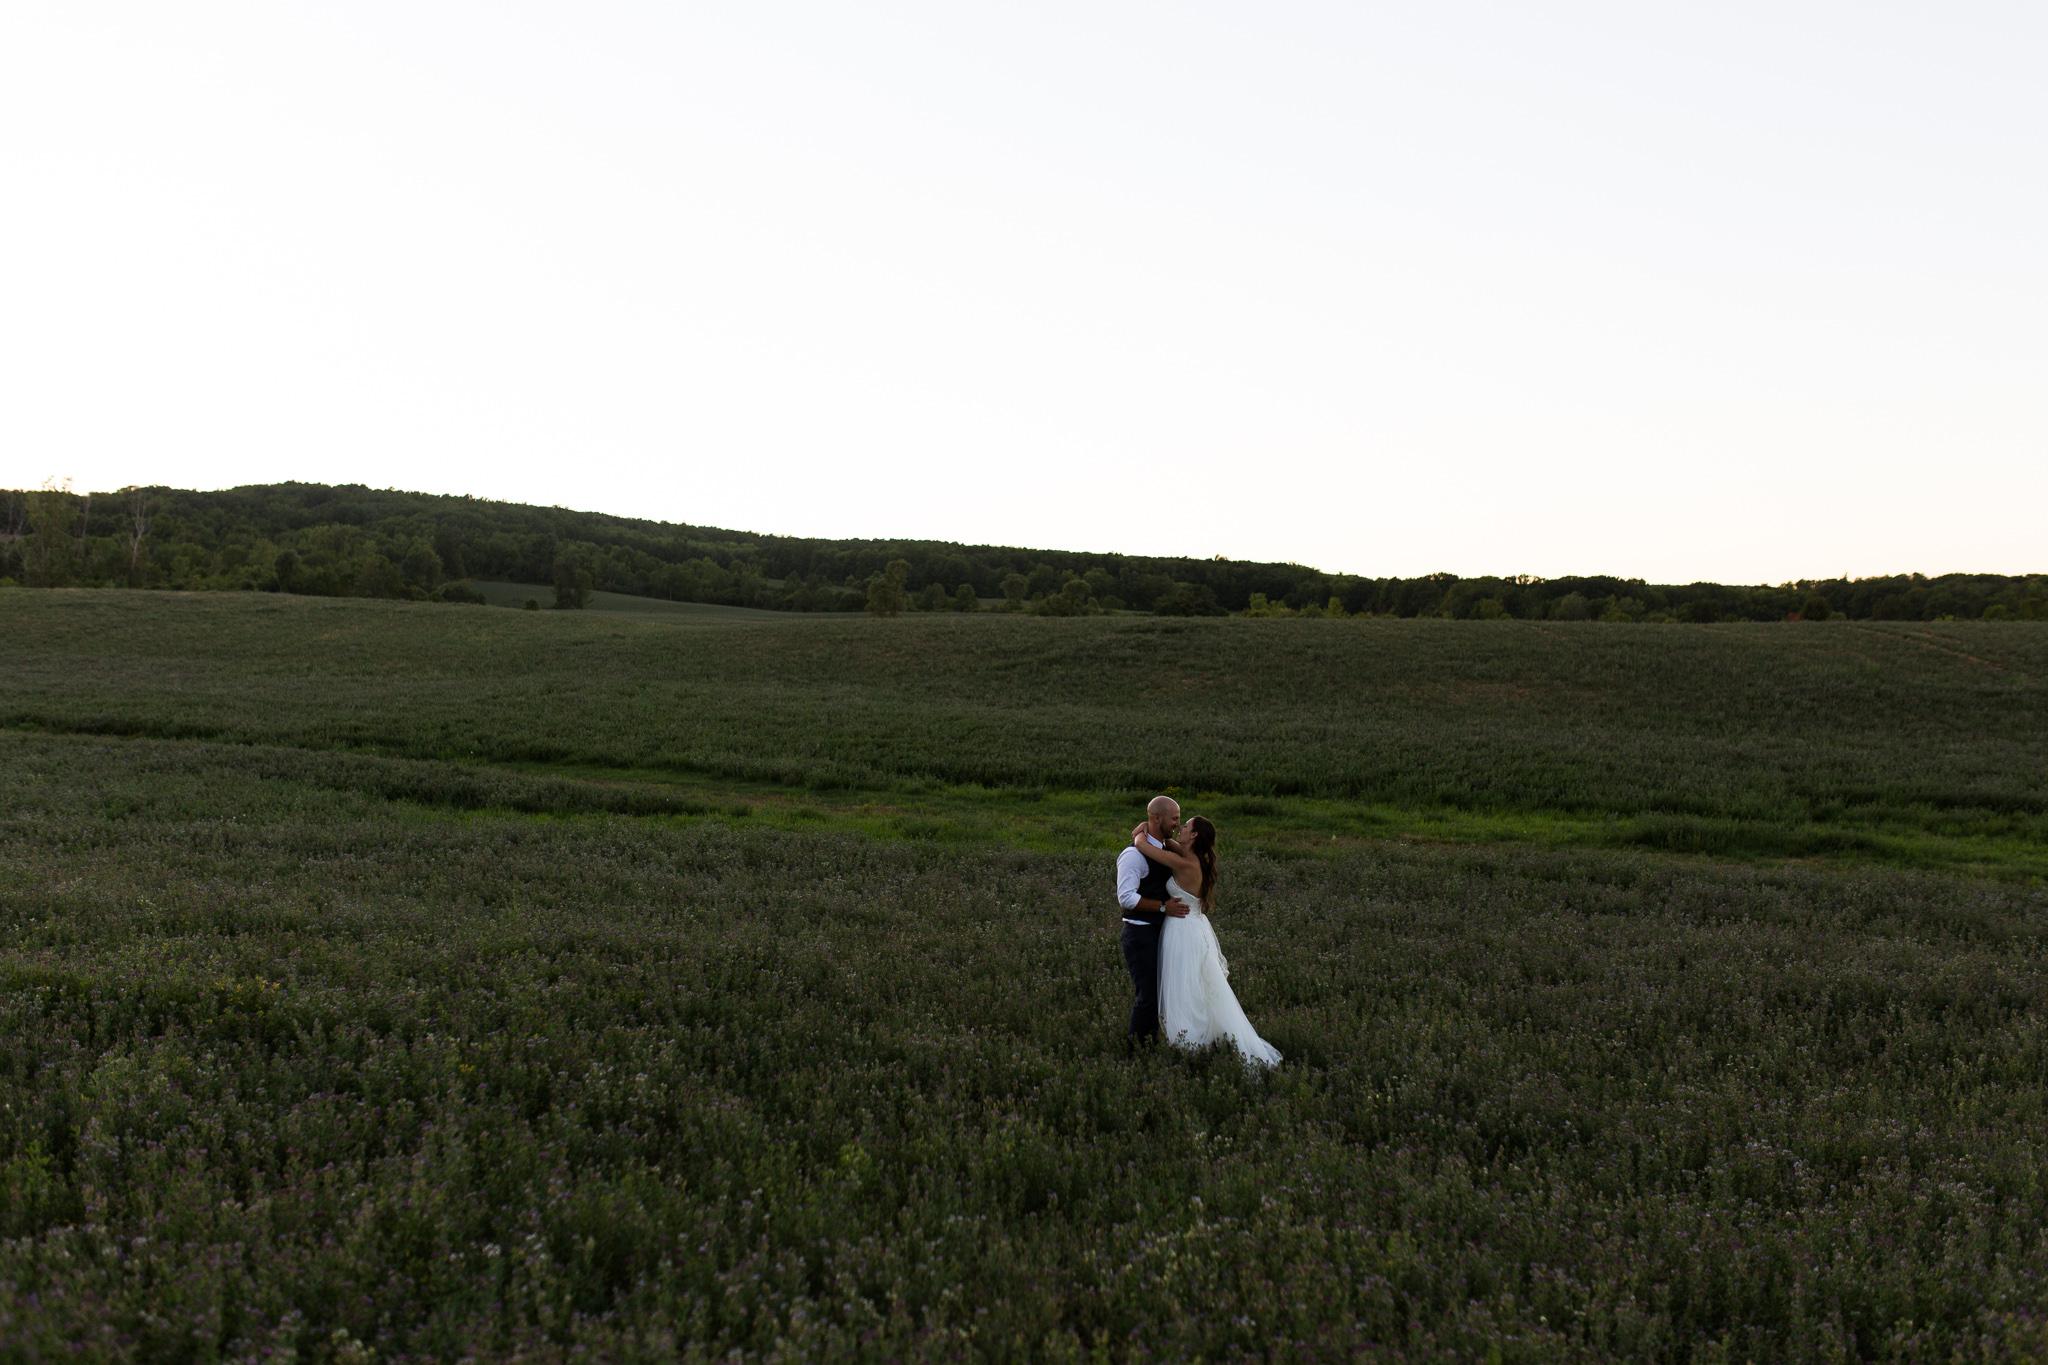 springer-house-burlington-wedding-photographer-621-of-756.jpg